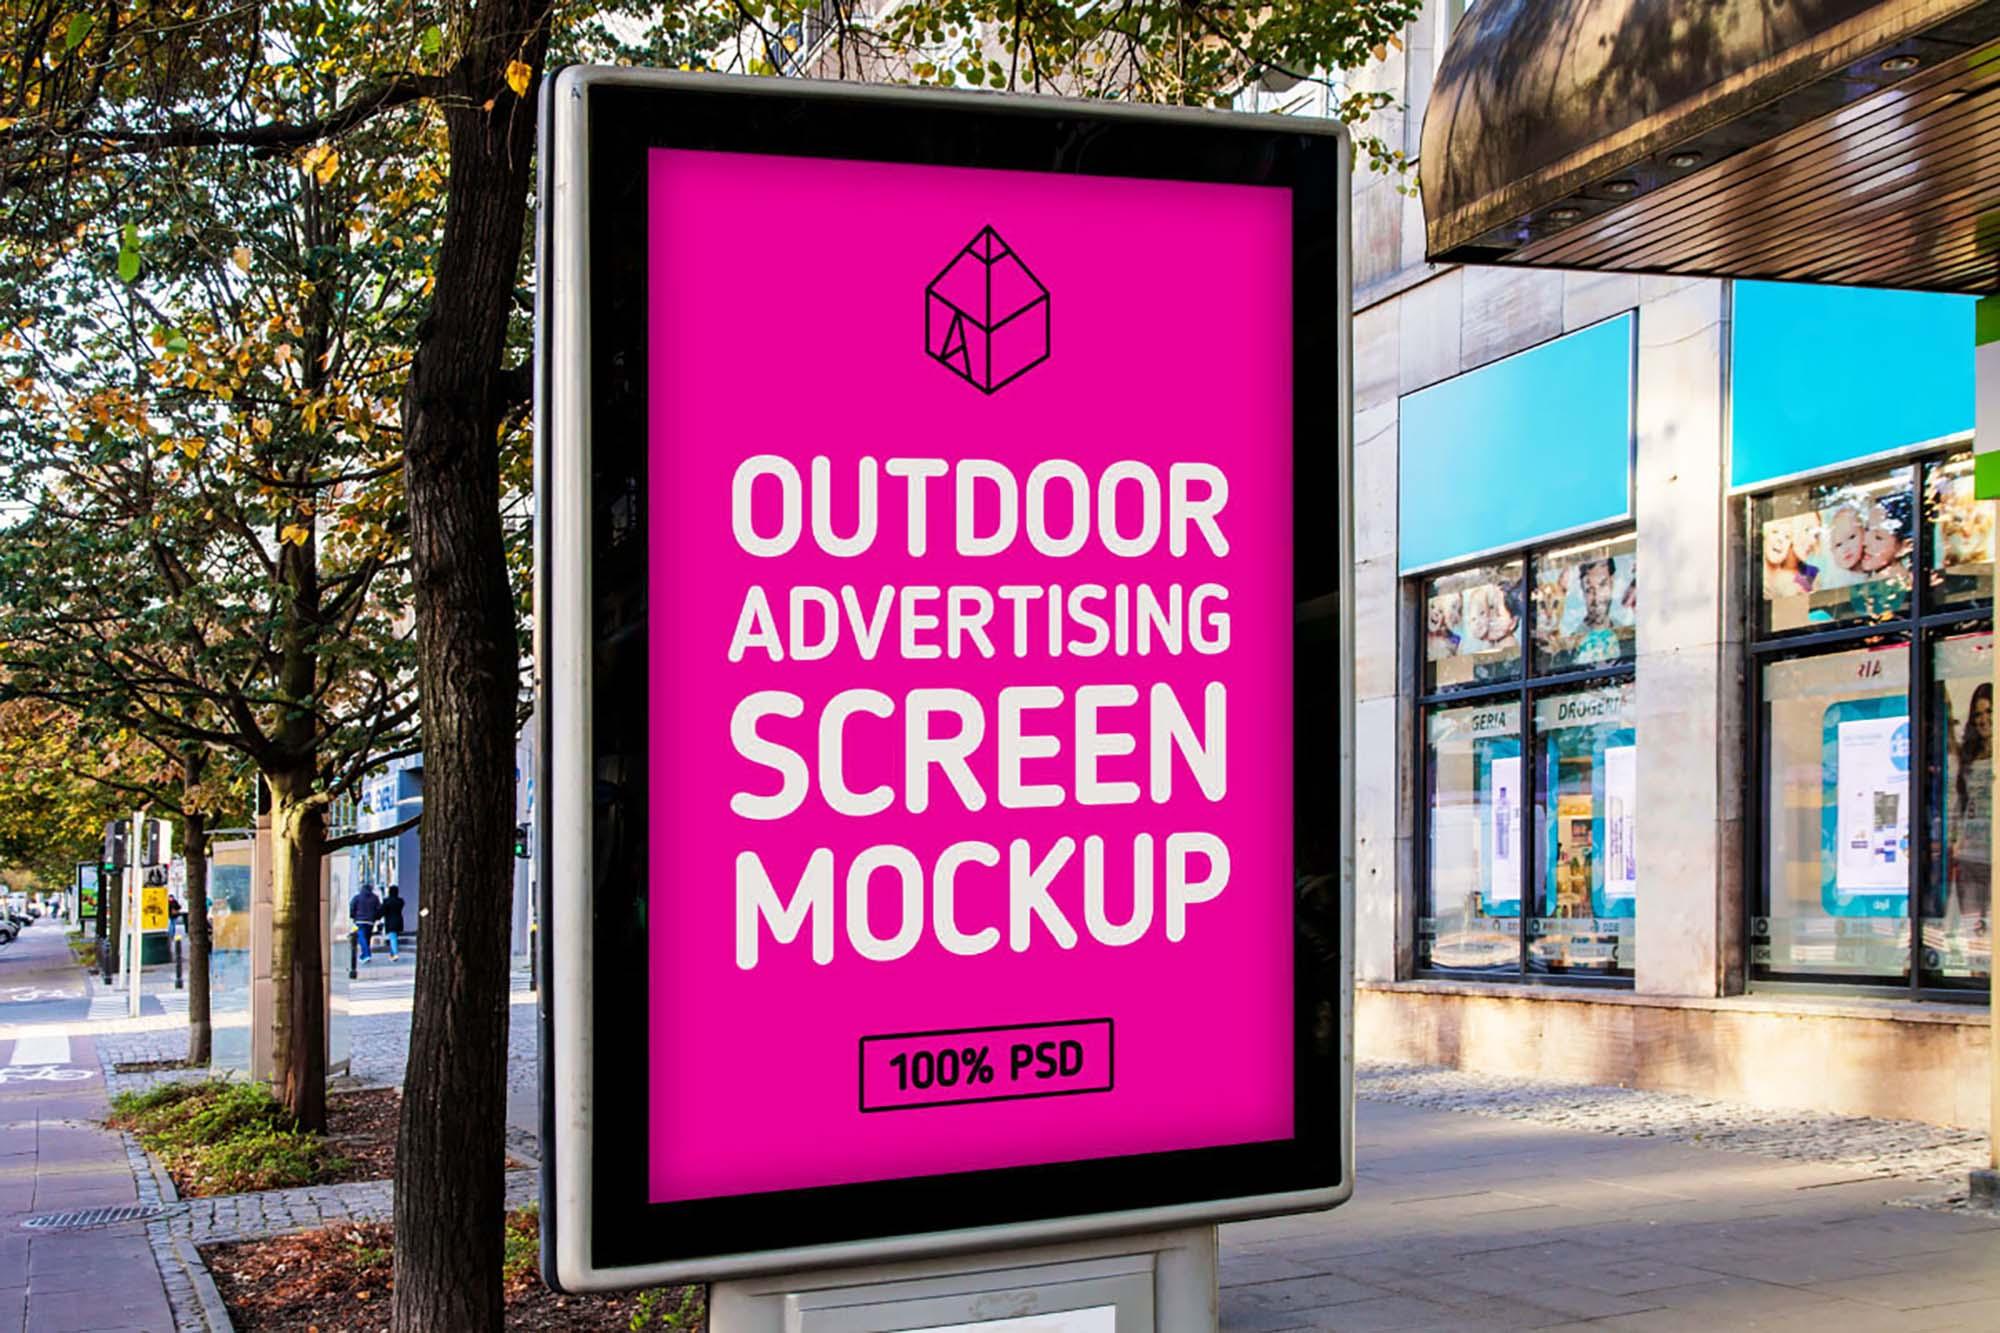 Outdoor Advertising Screen Mockup 2